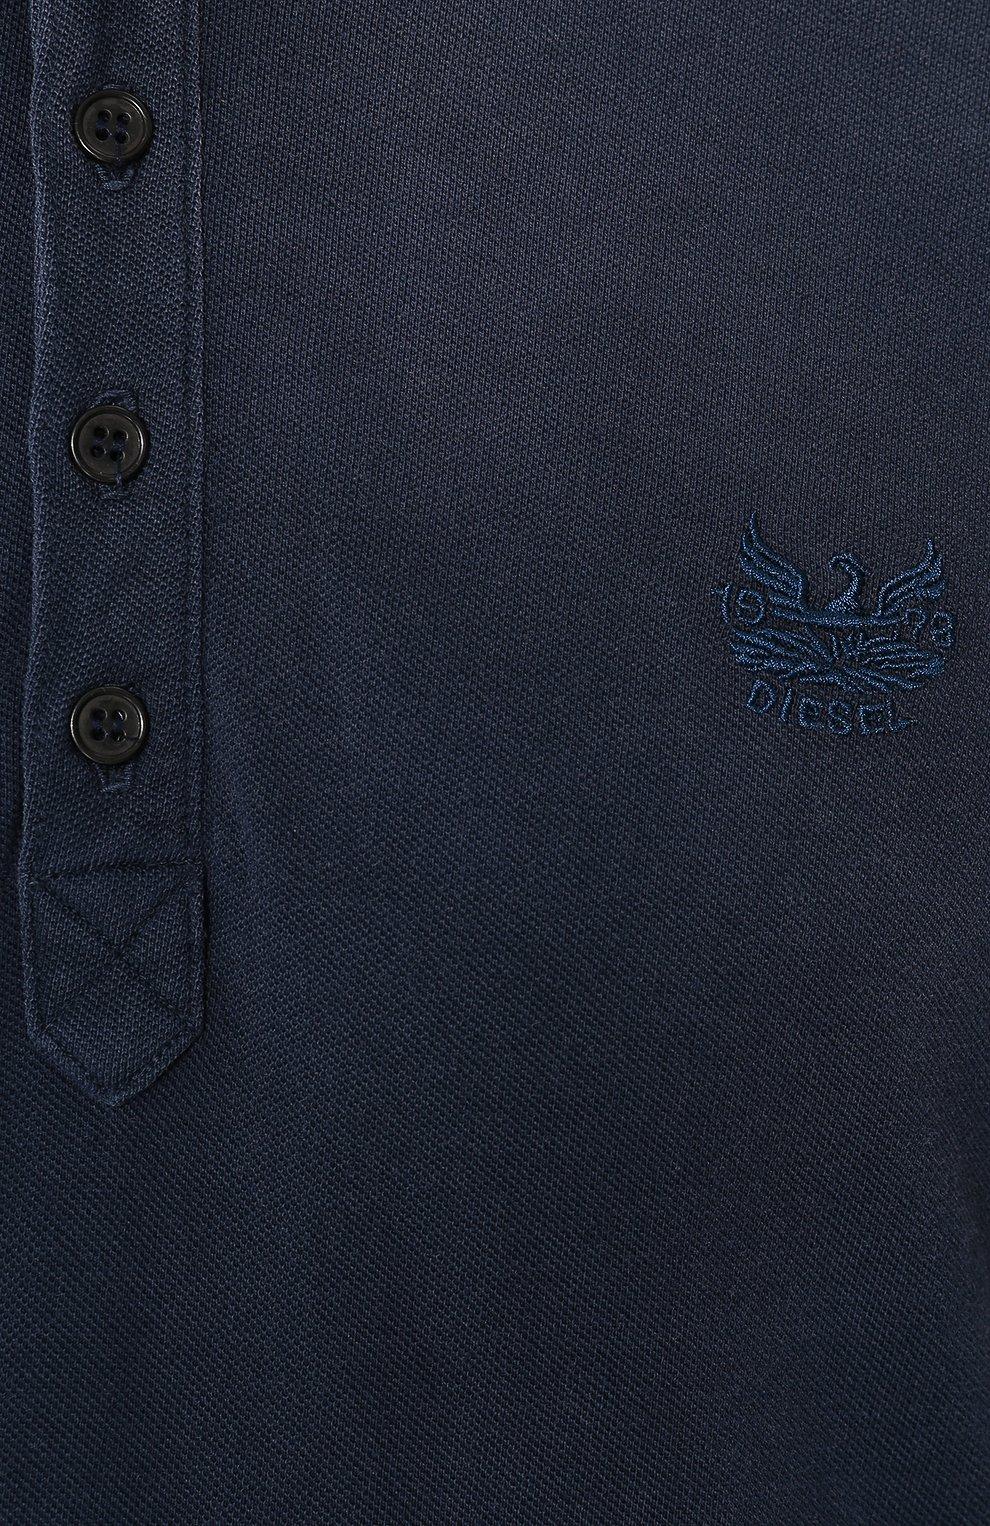 Хлопковое поло с короткими рукавами Diesel синее | Фото №5